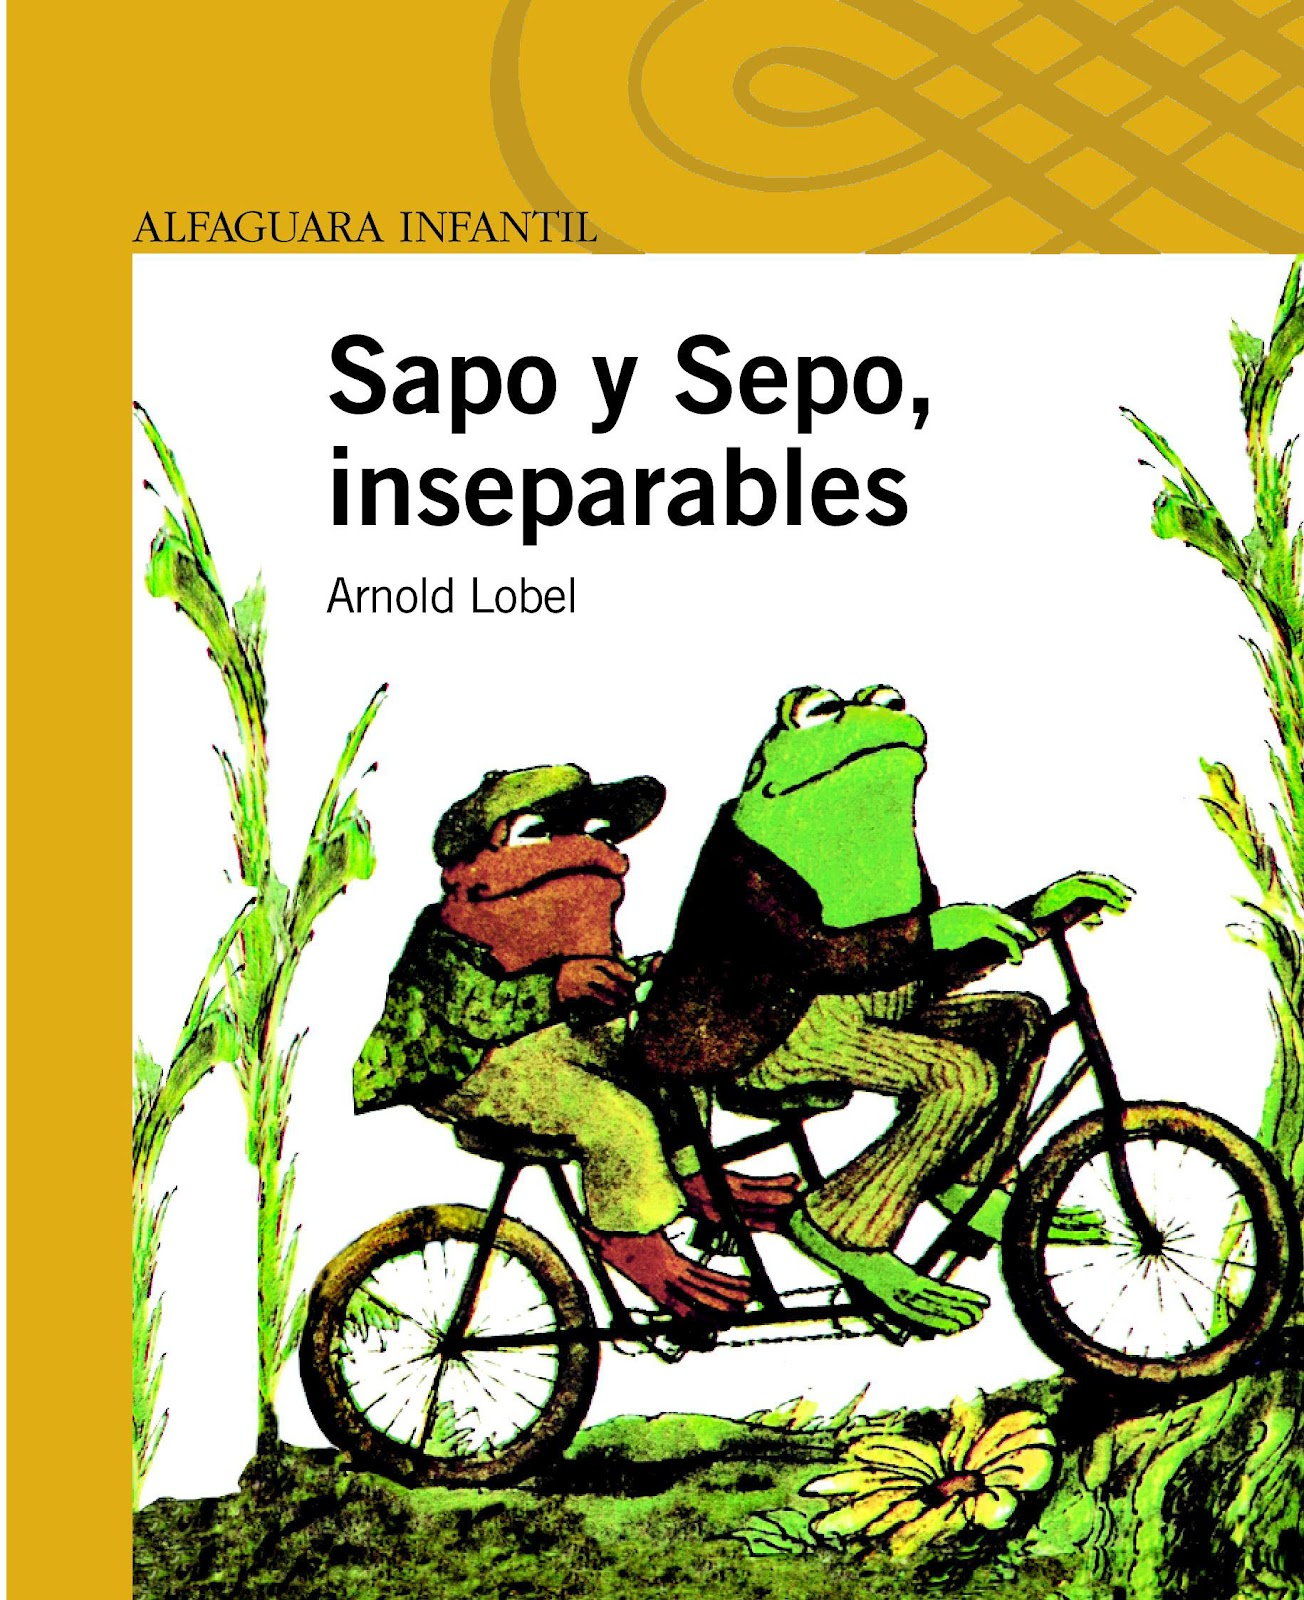 Sapo y Sepo, inseprables. Arnold Lobel. Alfaguara, 2002.